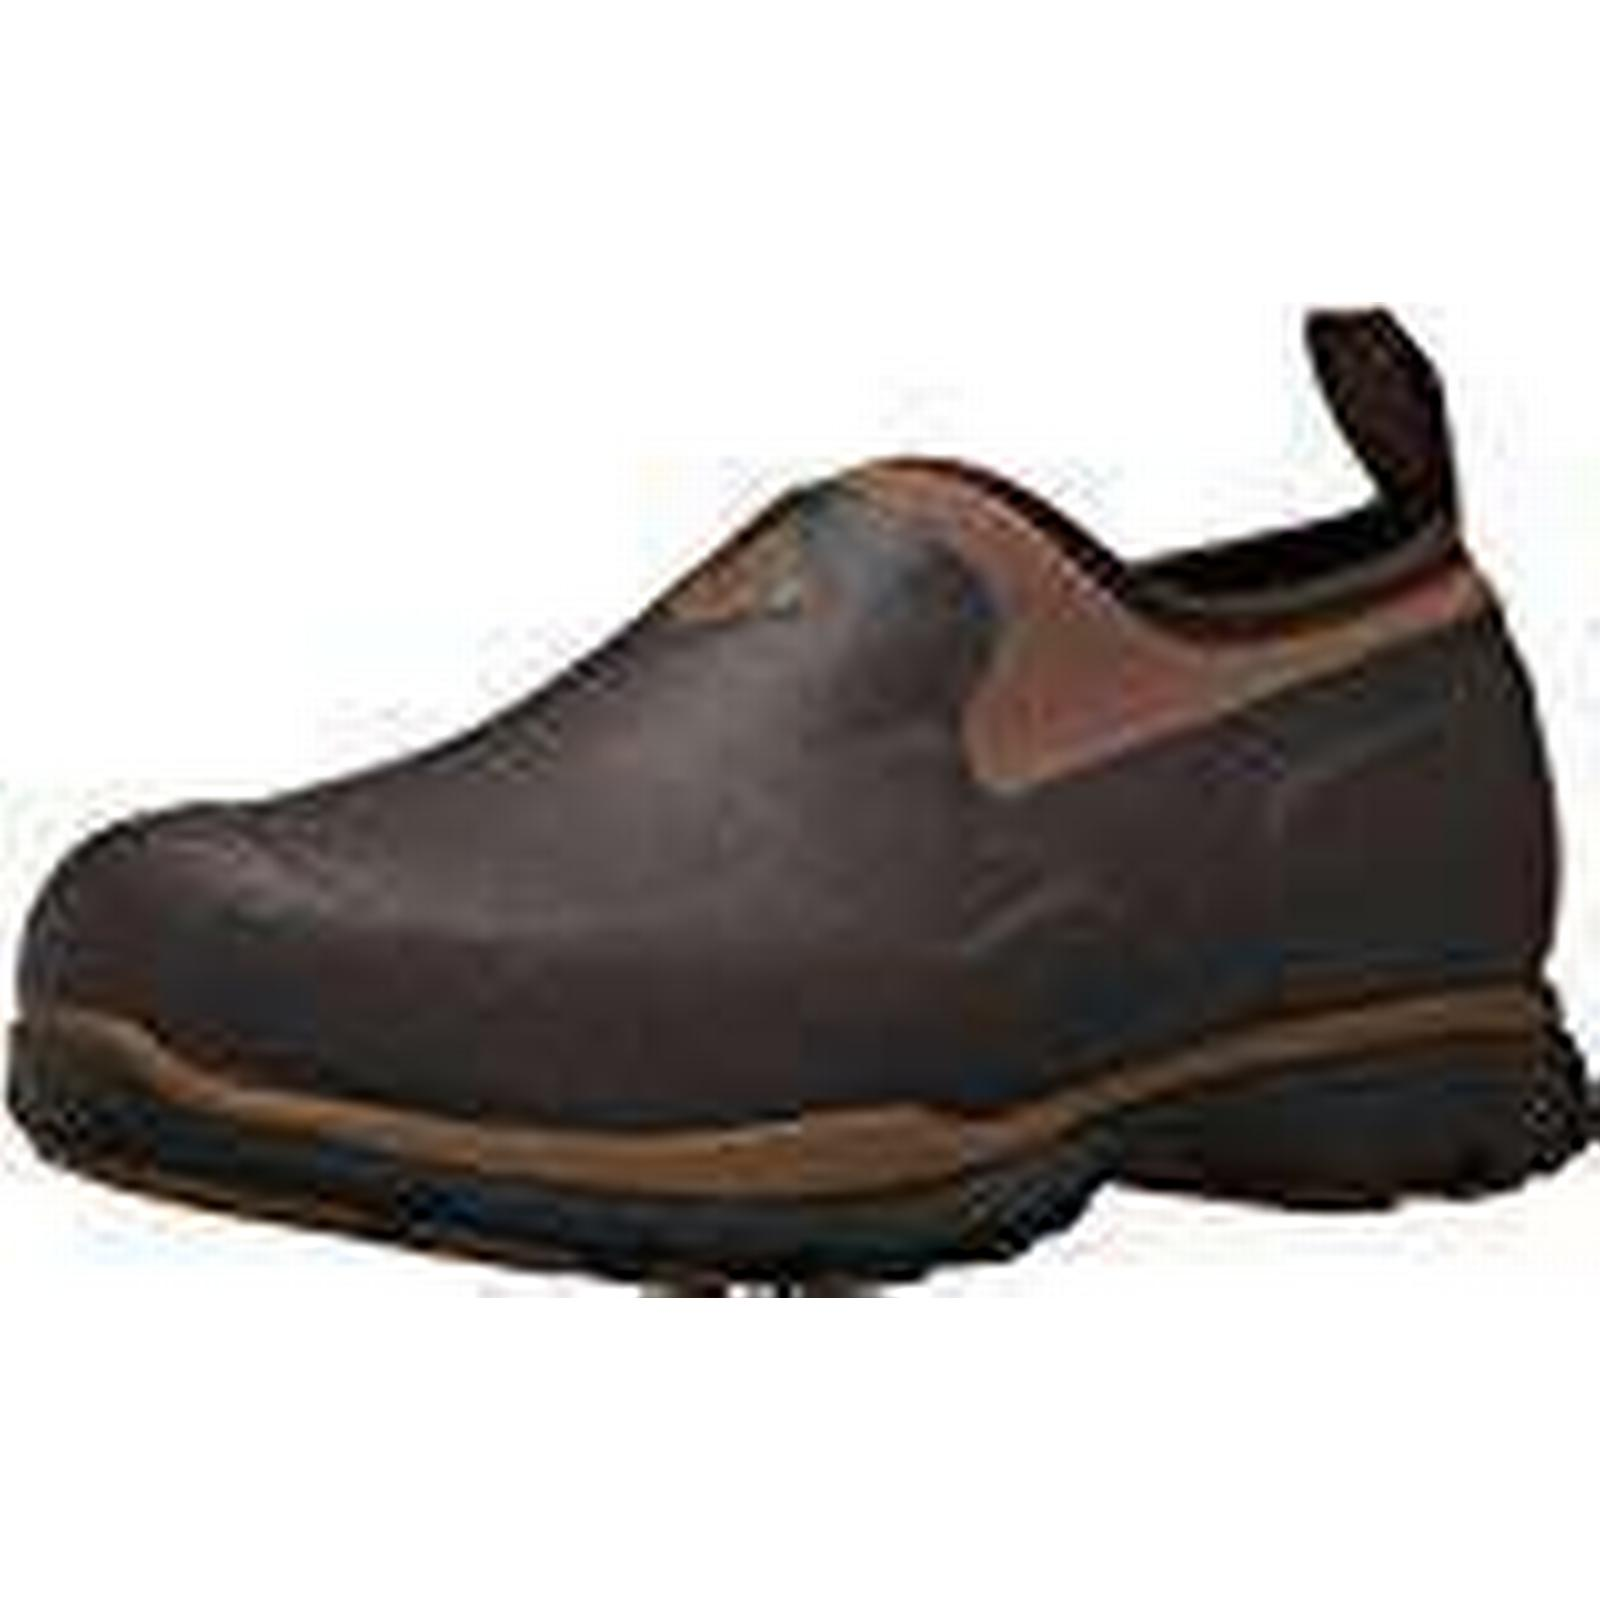 Muck (Bark/Otter), Boots Men's Excursion Pro Low Wellington Boots, Brown (Bark/Otter), Muck 12 UK 47 EU 710a48